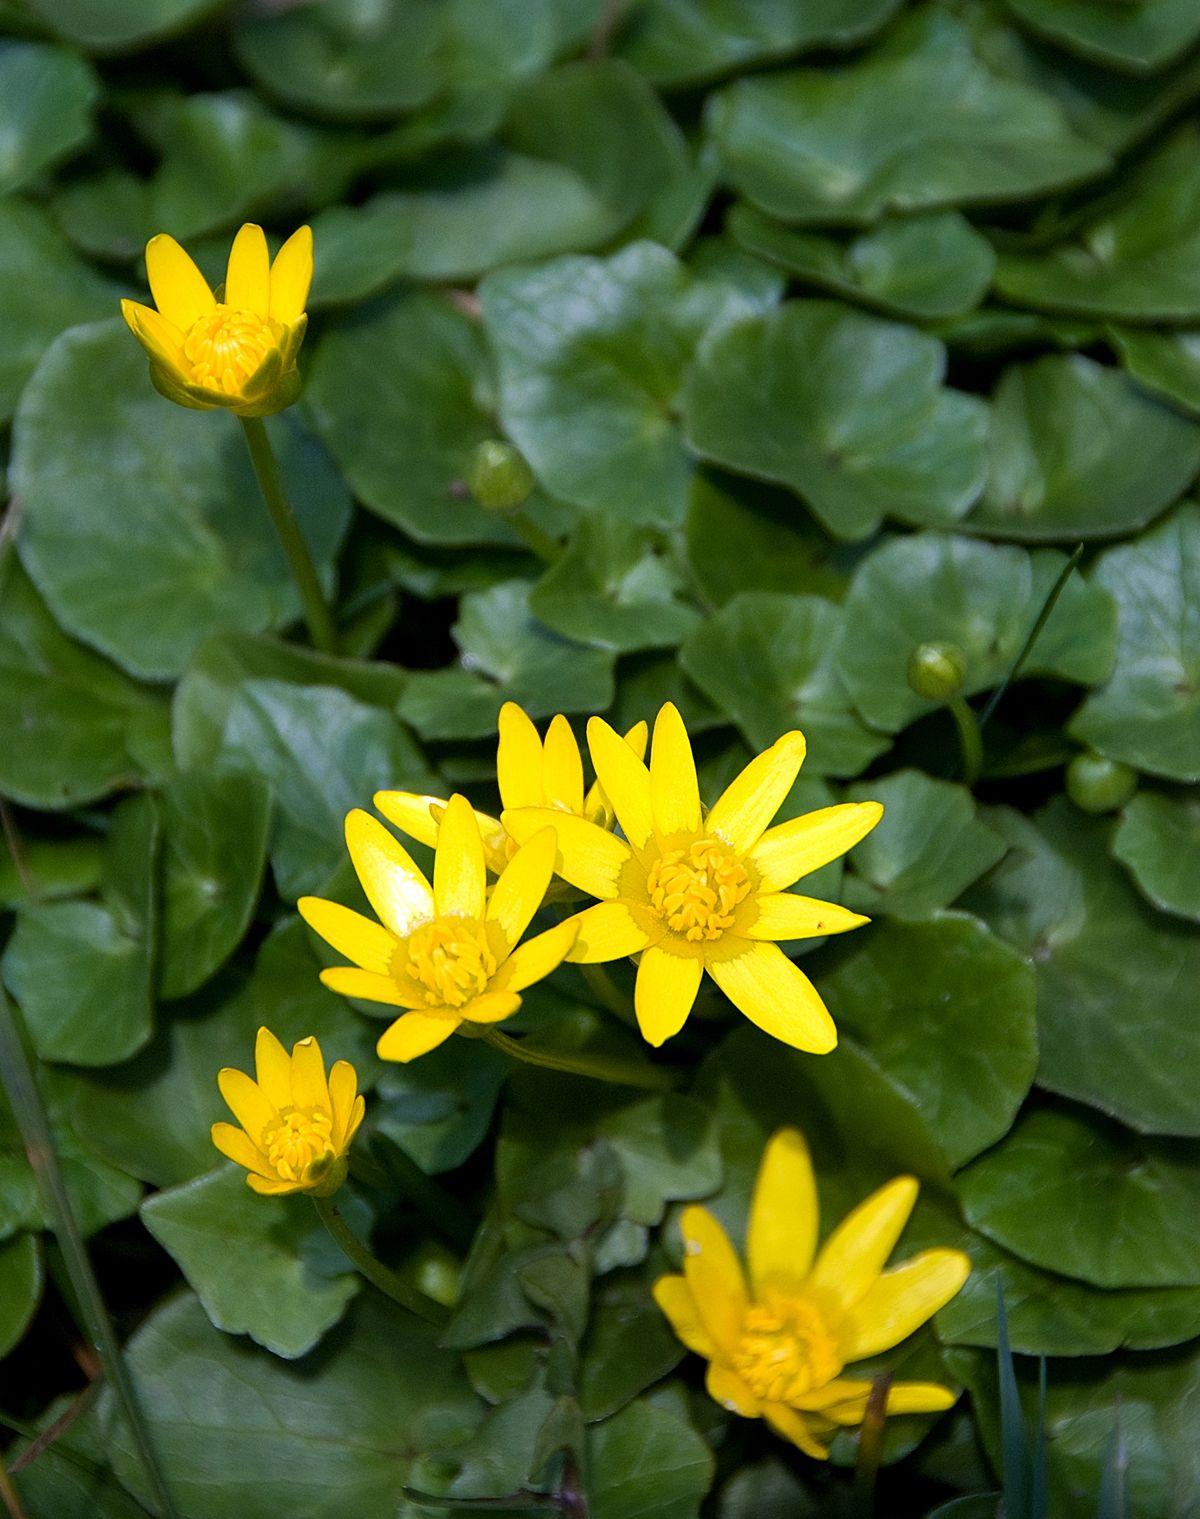 Ficaria Verna Wikipedia Yellow Flowers Names Yellow Flowers Perennial Flowering Plants